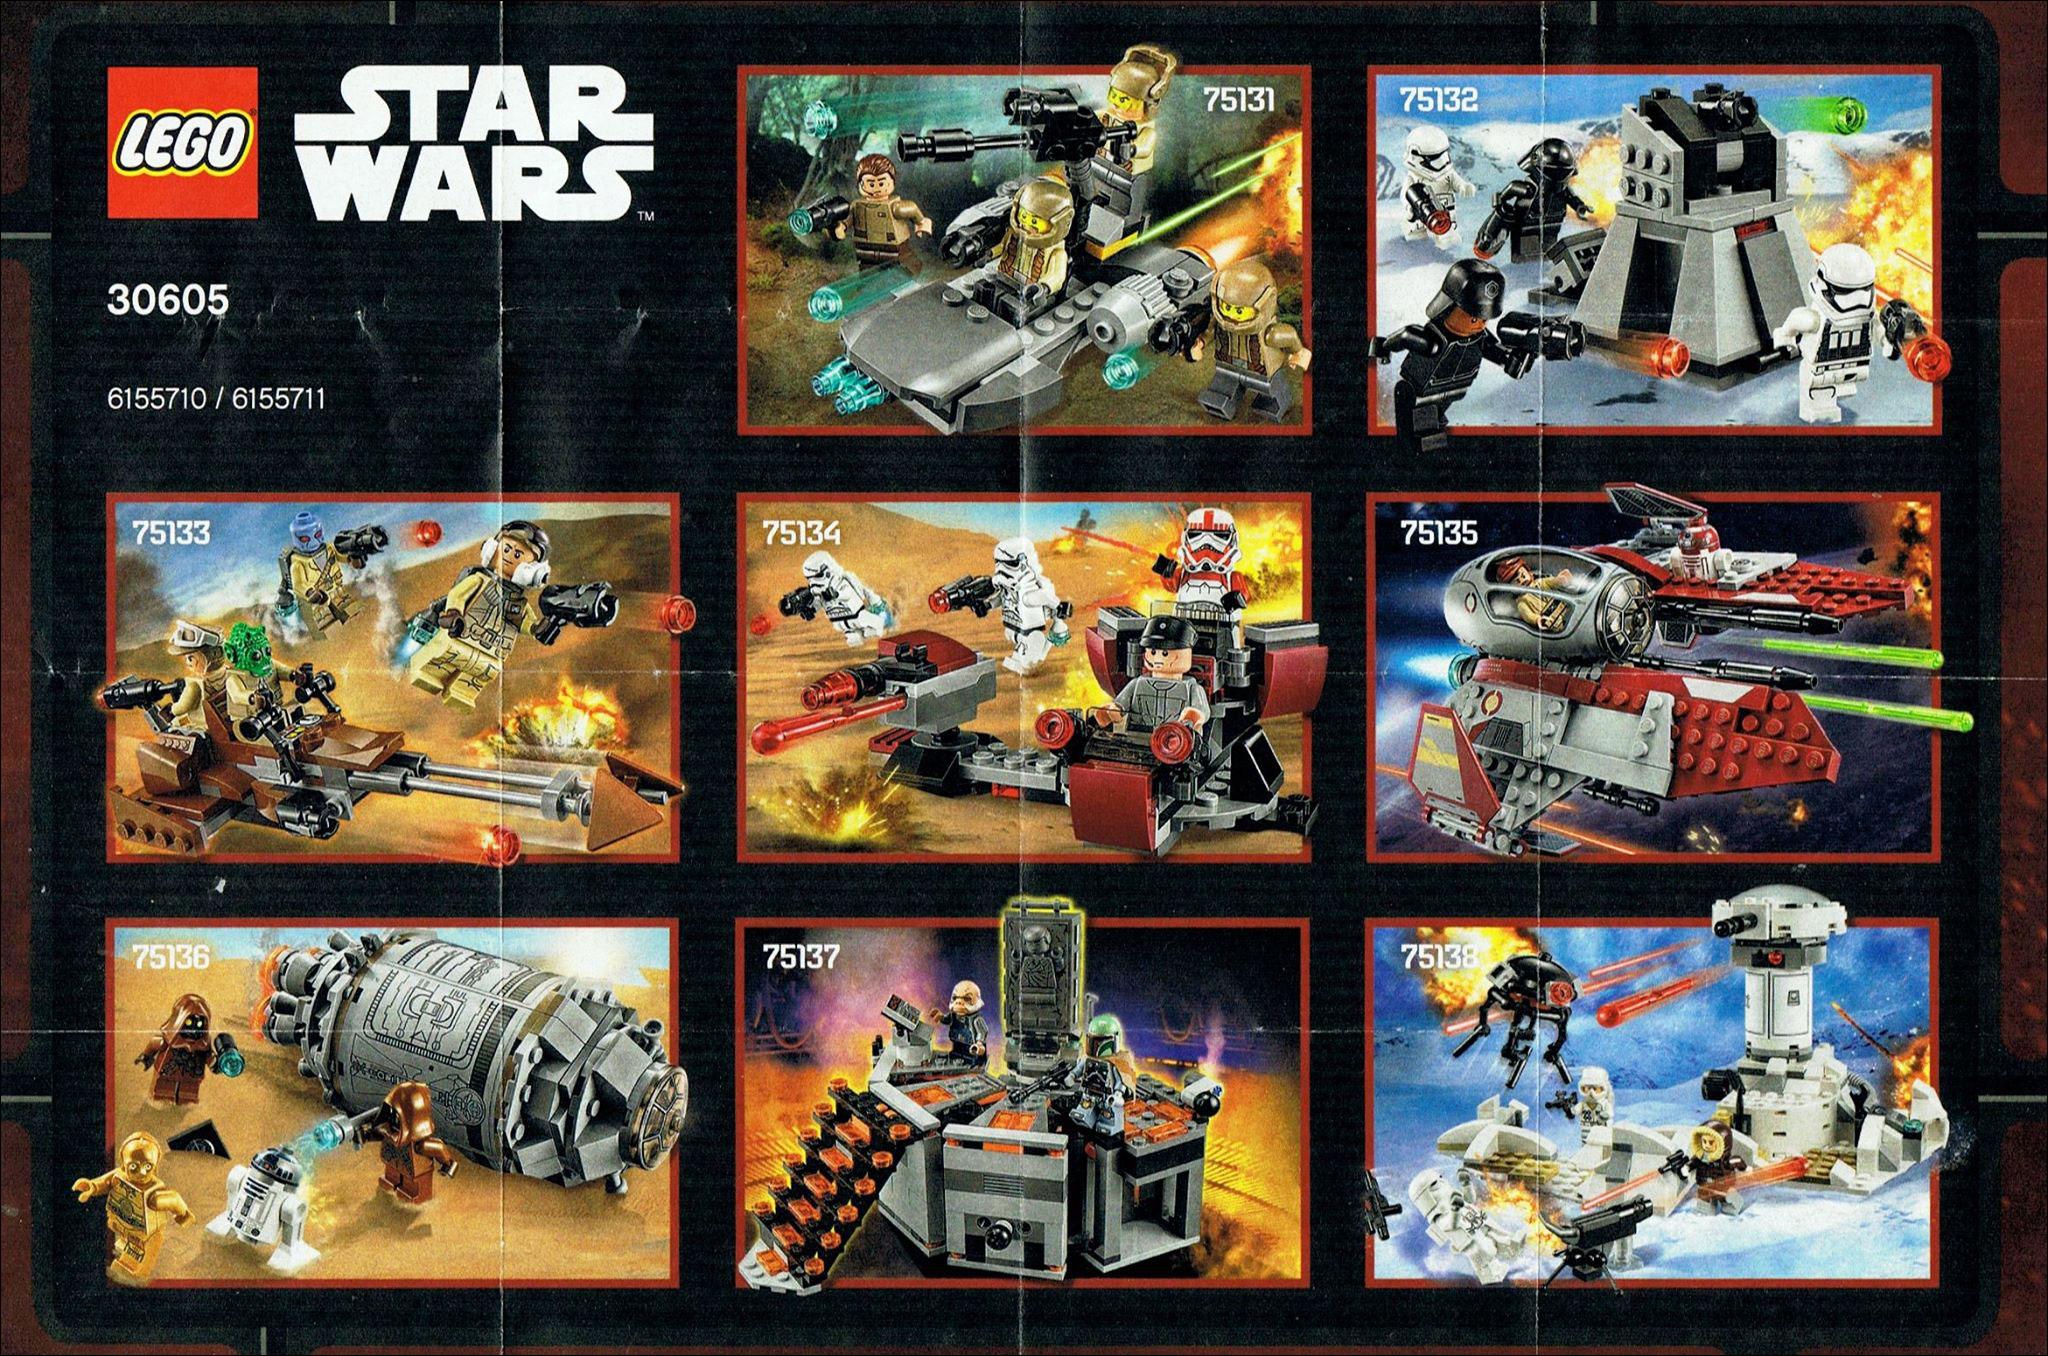 Lego star wars 2016 les nouveaux sets star wars 7 les - Image star wars lego ...